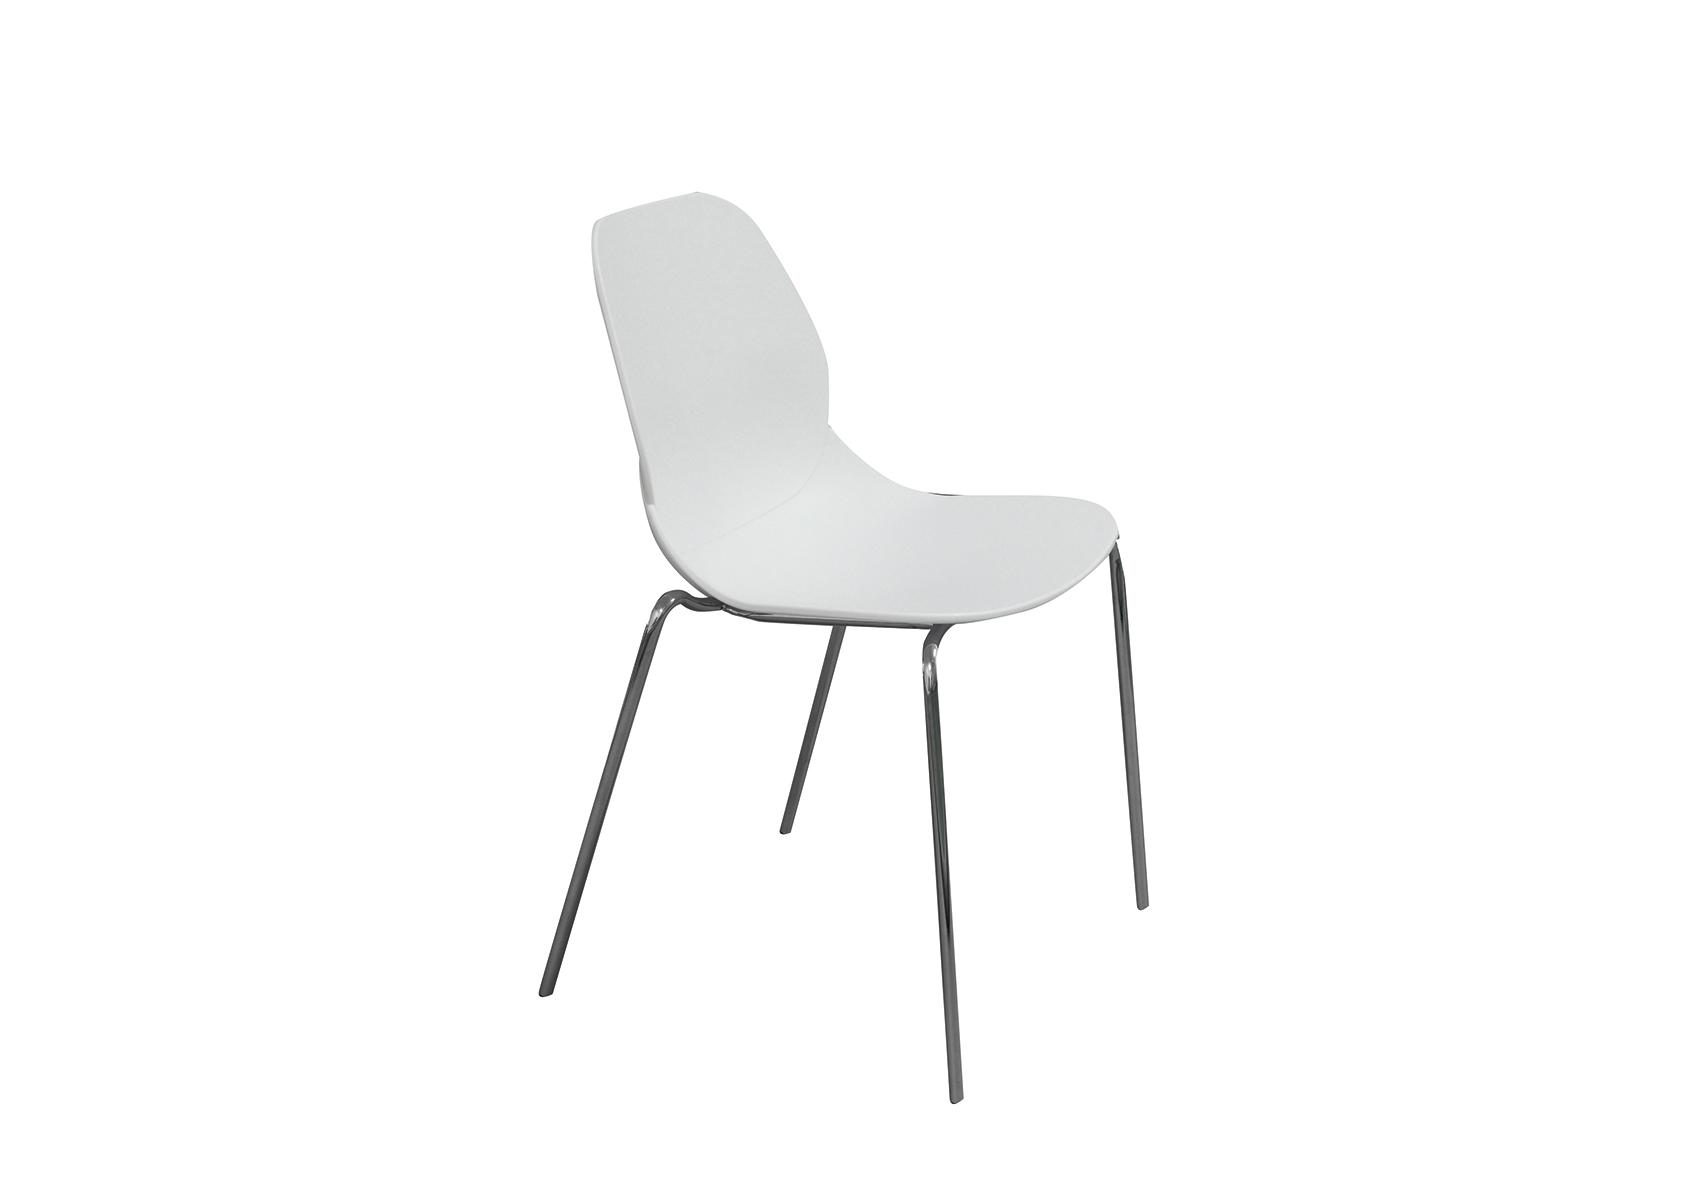 Стул CT-615 белыйОбеденные стулья<br><br><br>Material: Пластик<br>Ширина см: 54<br>Высота см: 82<br>Глубина см: 49